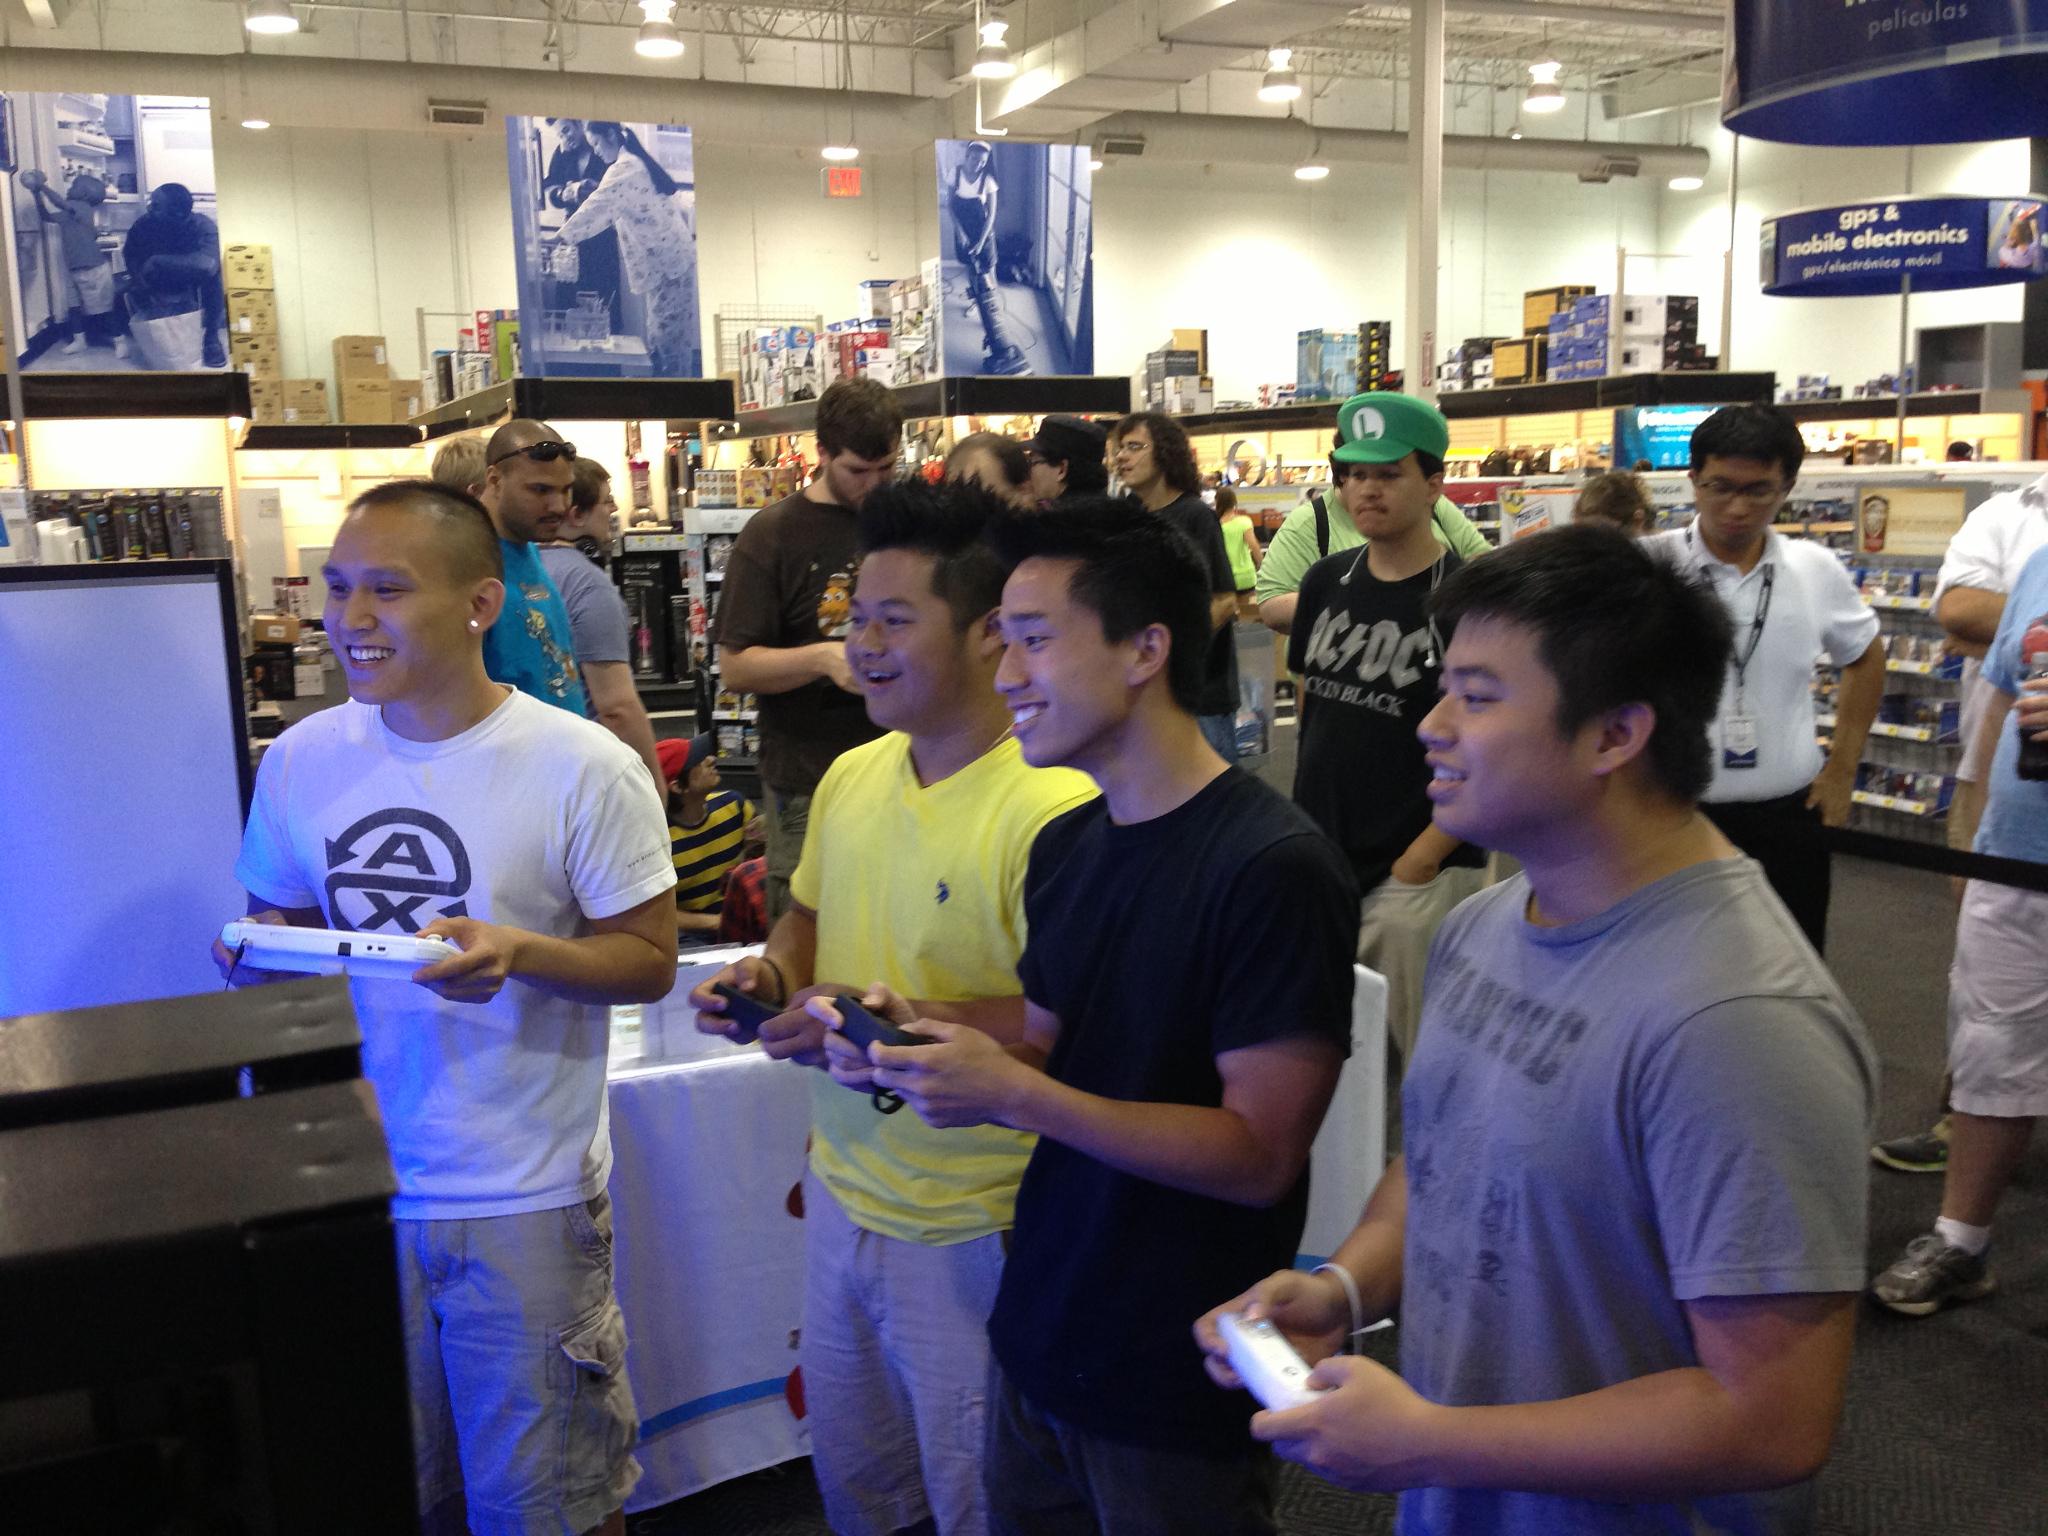 Wii U demo reaction